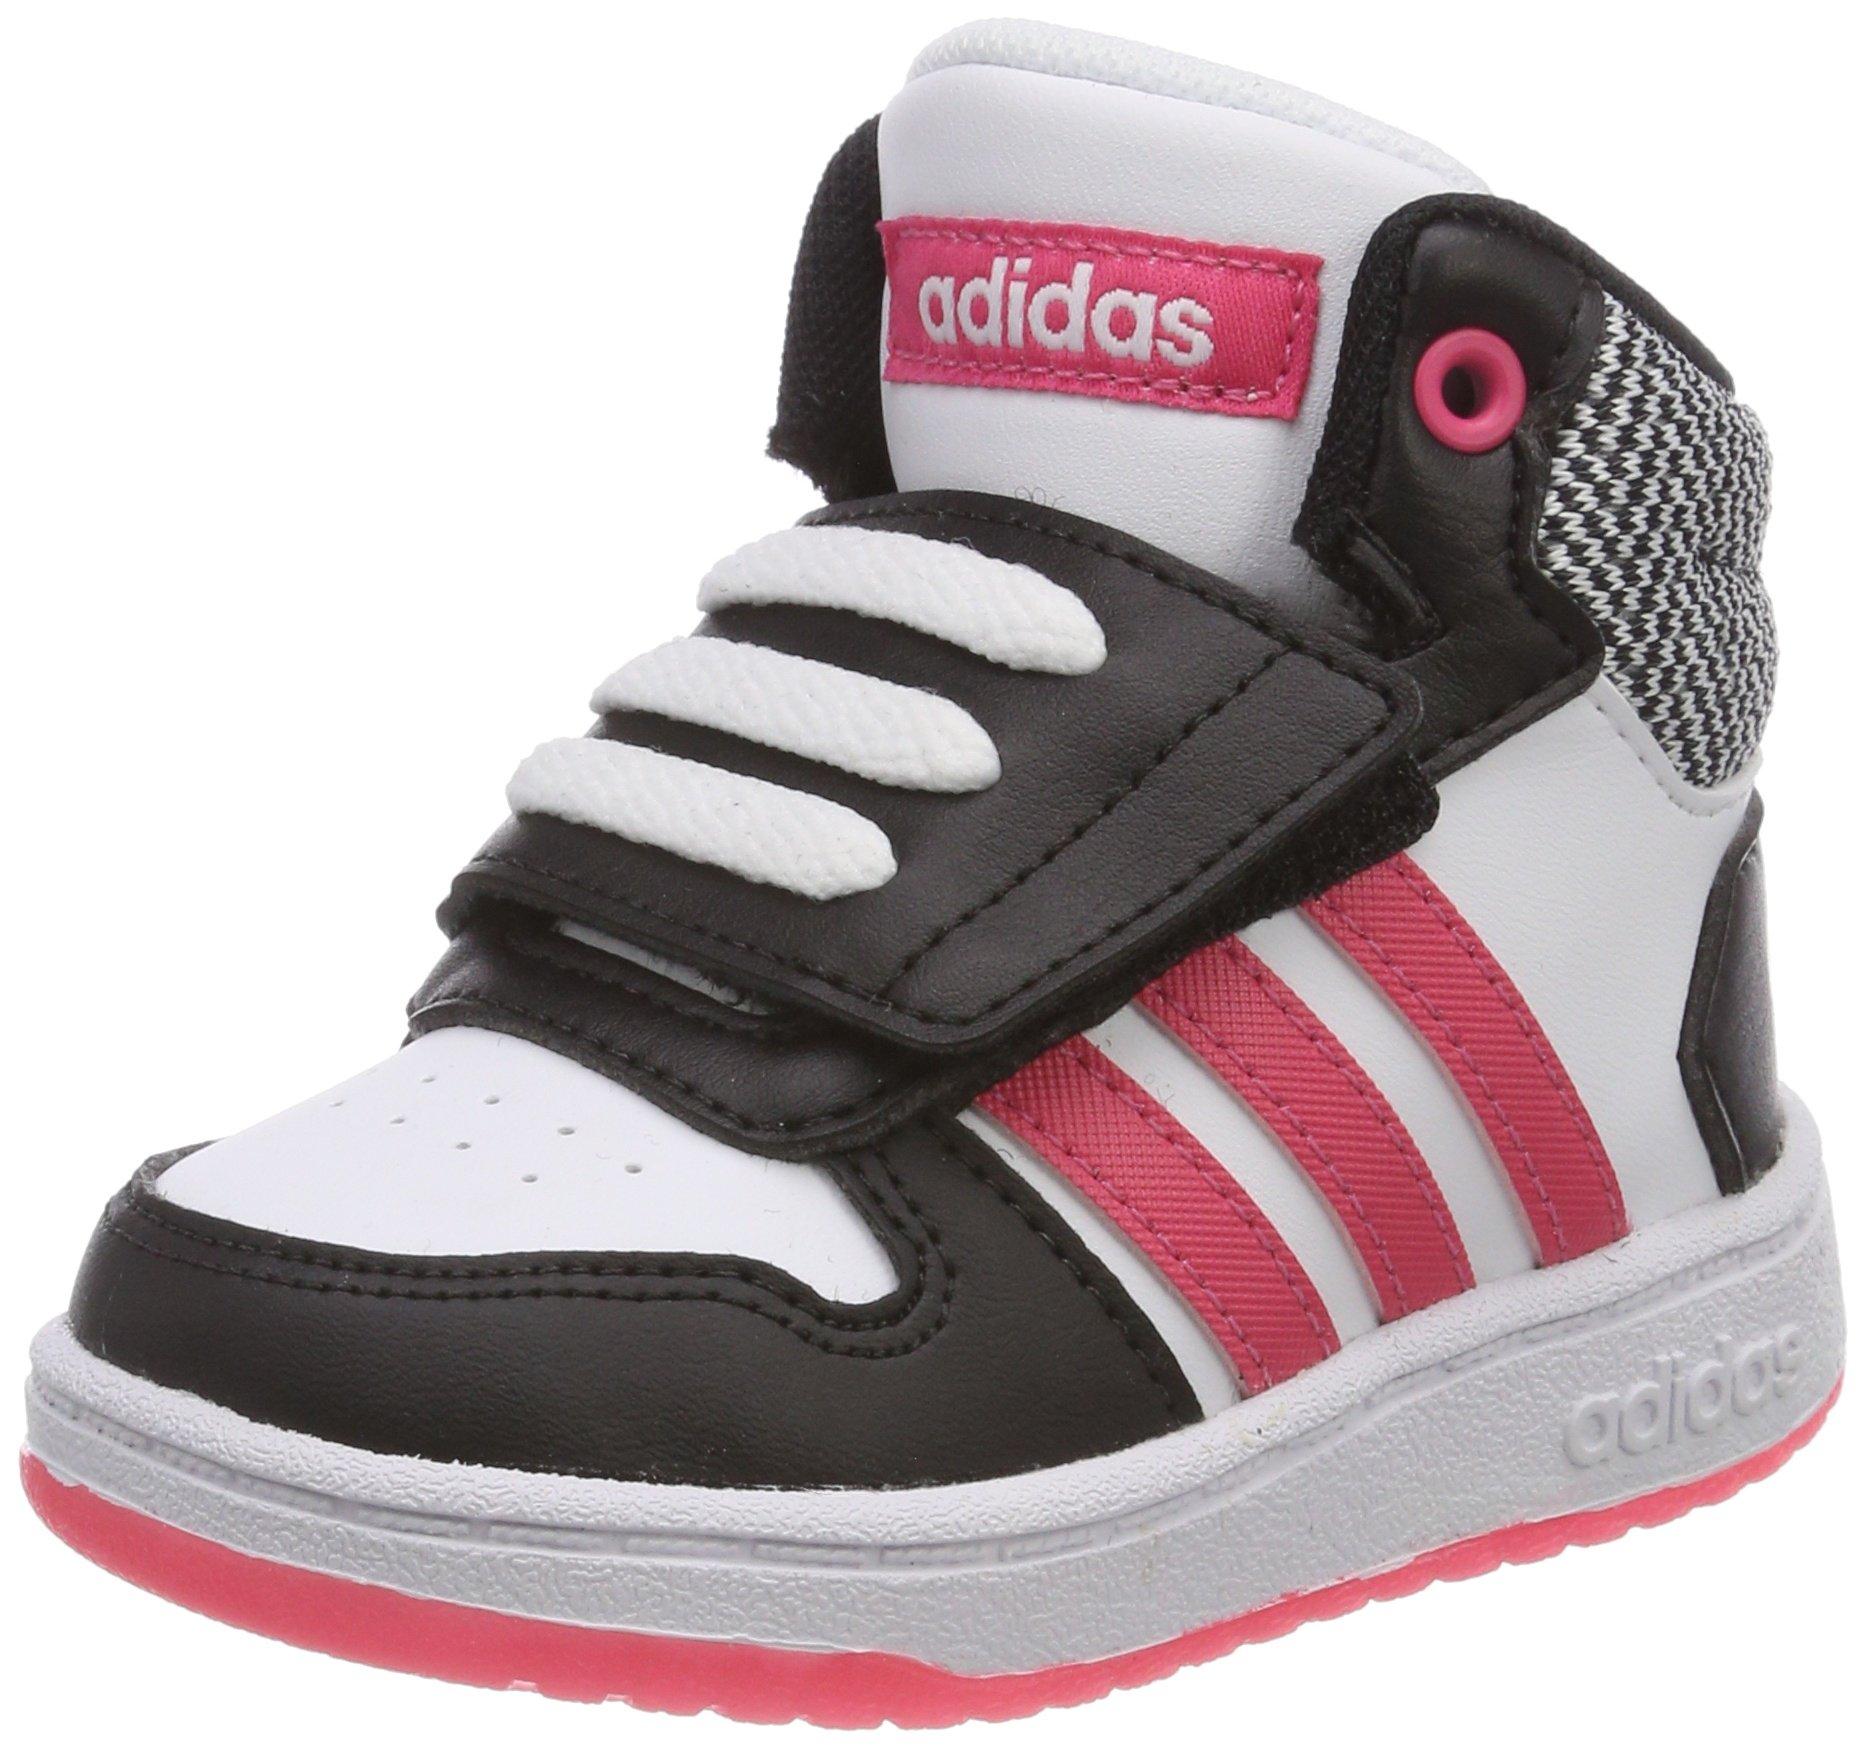 c3cad68187 adidas Unisex-Kinder Hoops Mid 2.0 Basketballschuhe Weiß Ftwwht ...